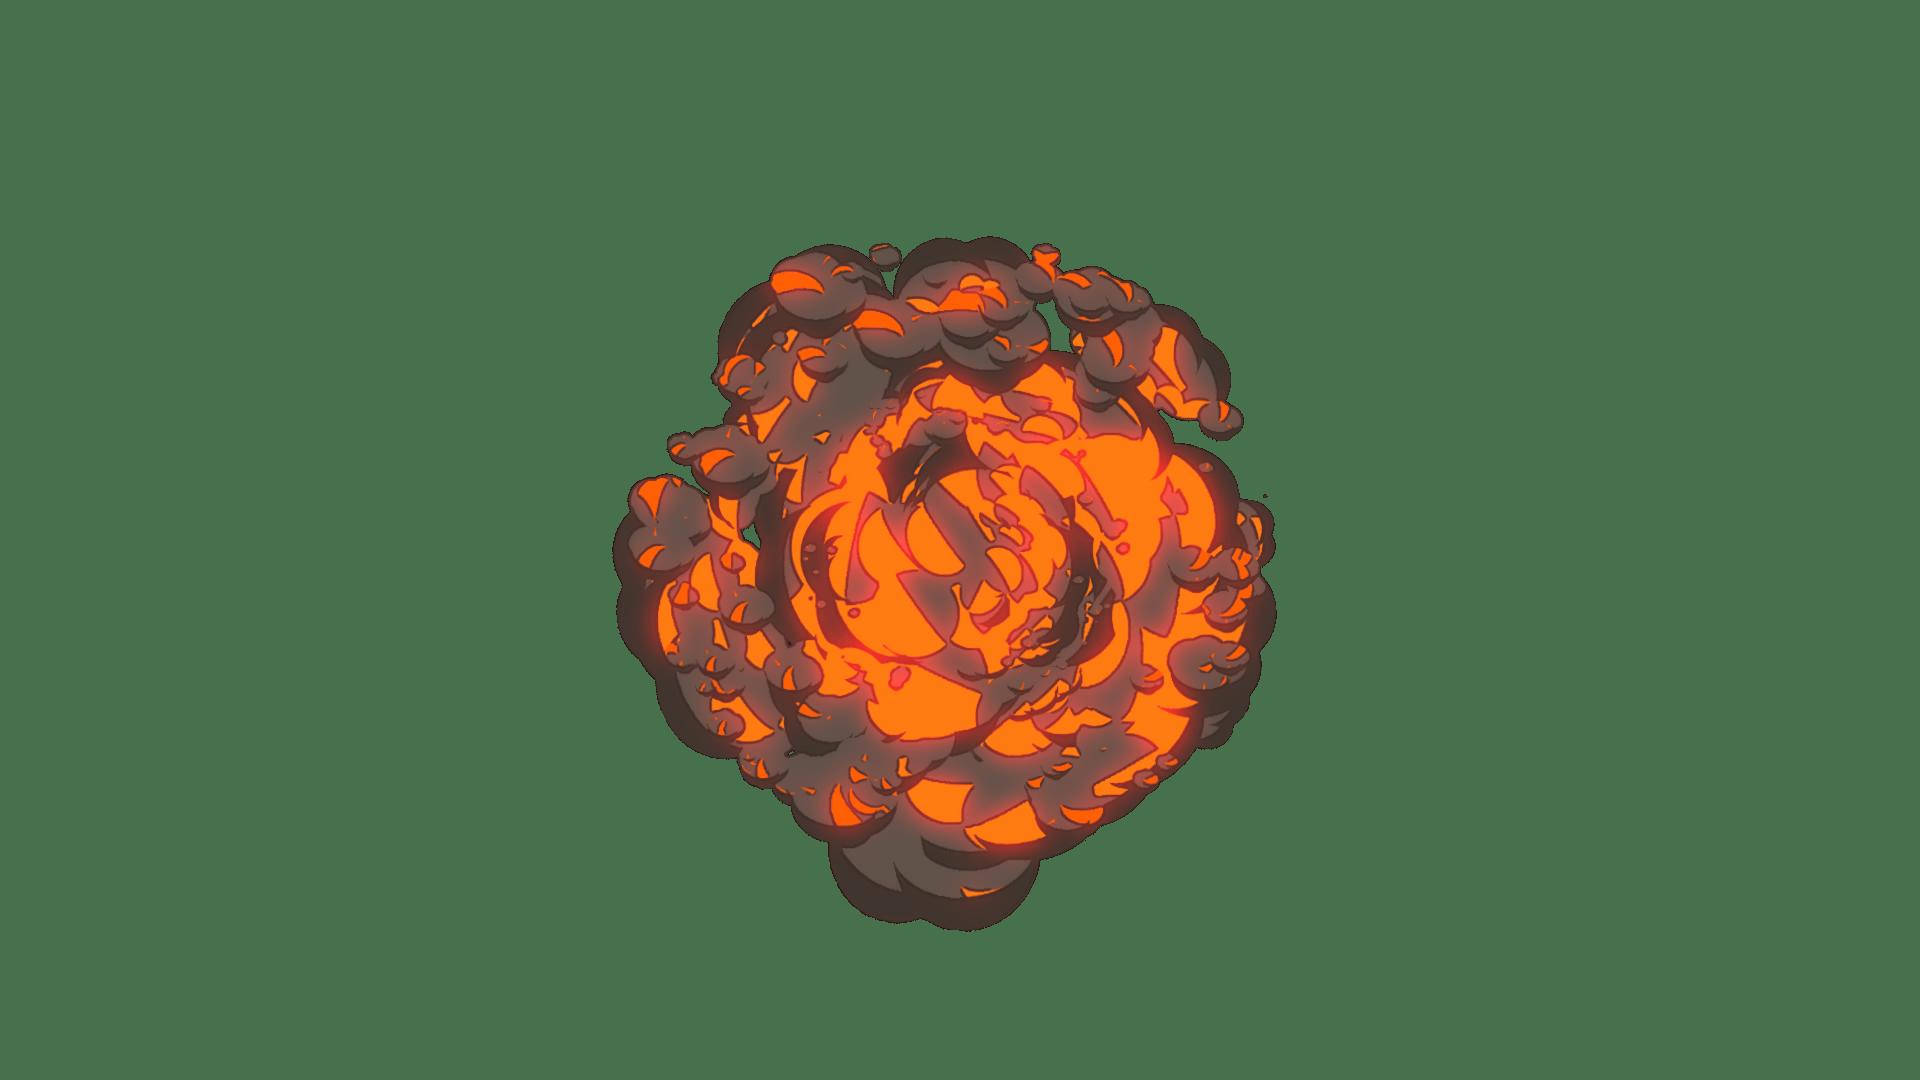 Cartoon Explosion Brown Smoke 5 - Video Effect | FootageCrate